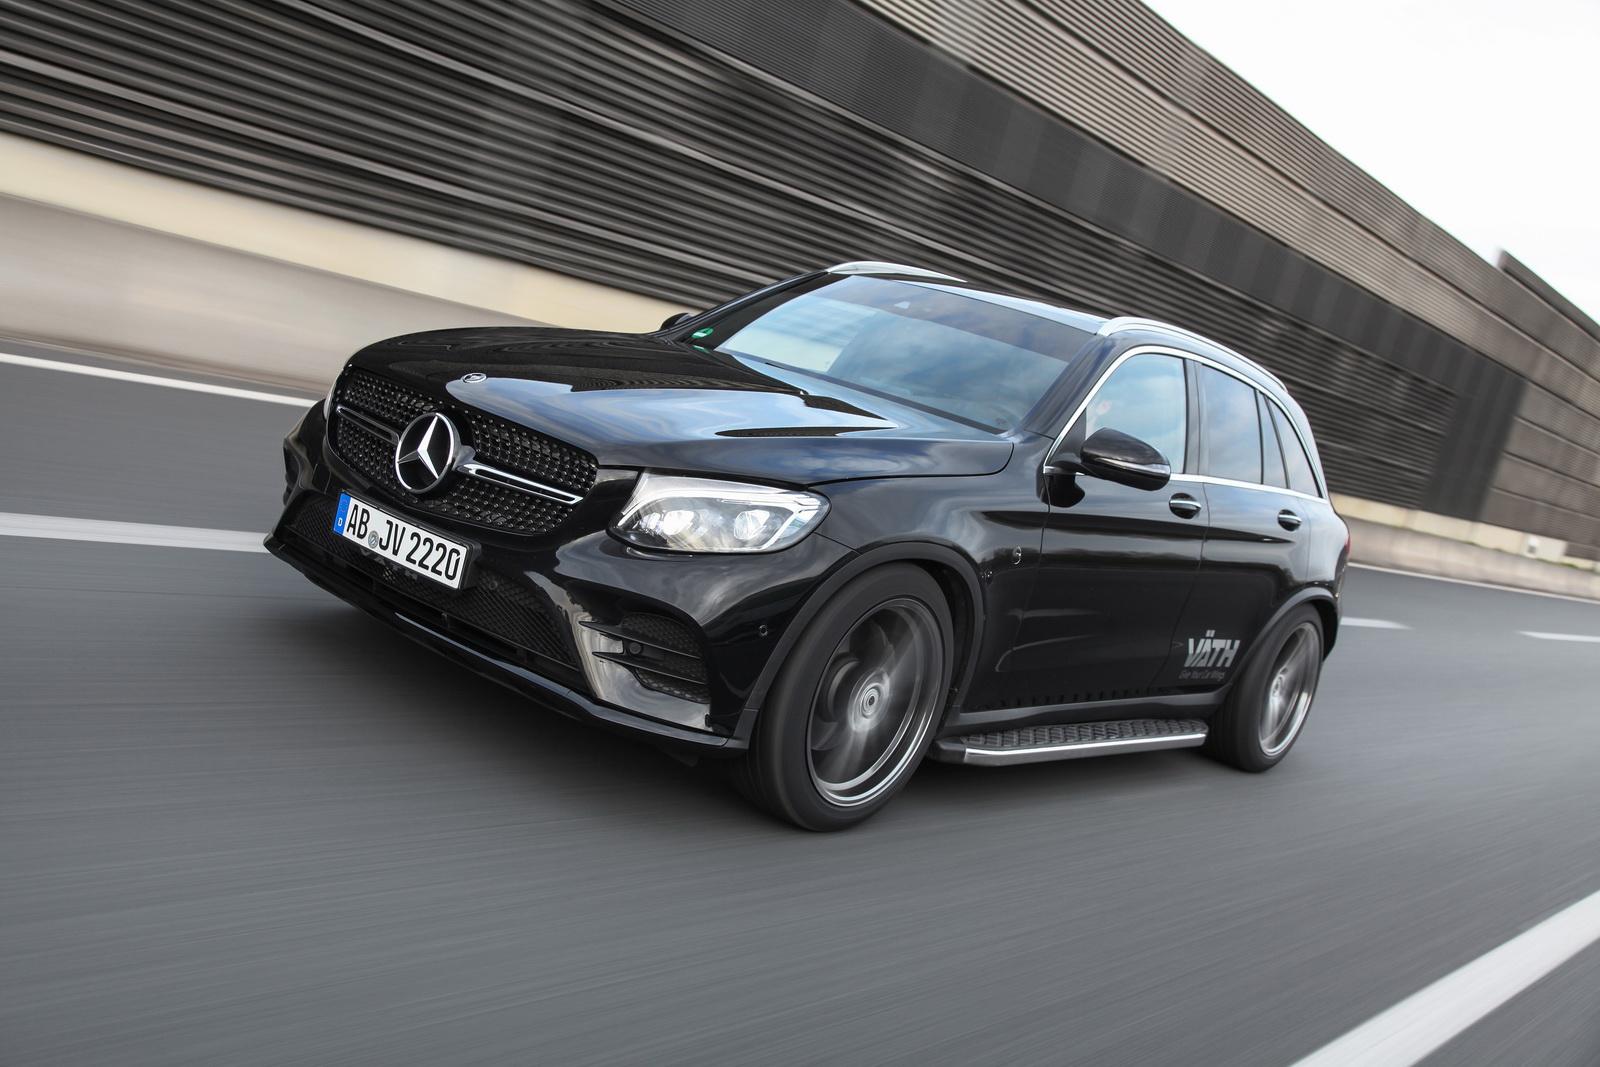 Mercedes_GLC220d_by_Vath_16